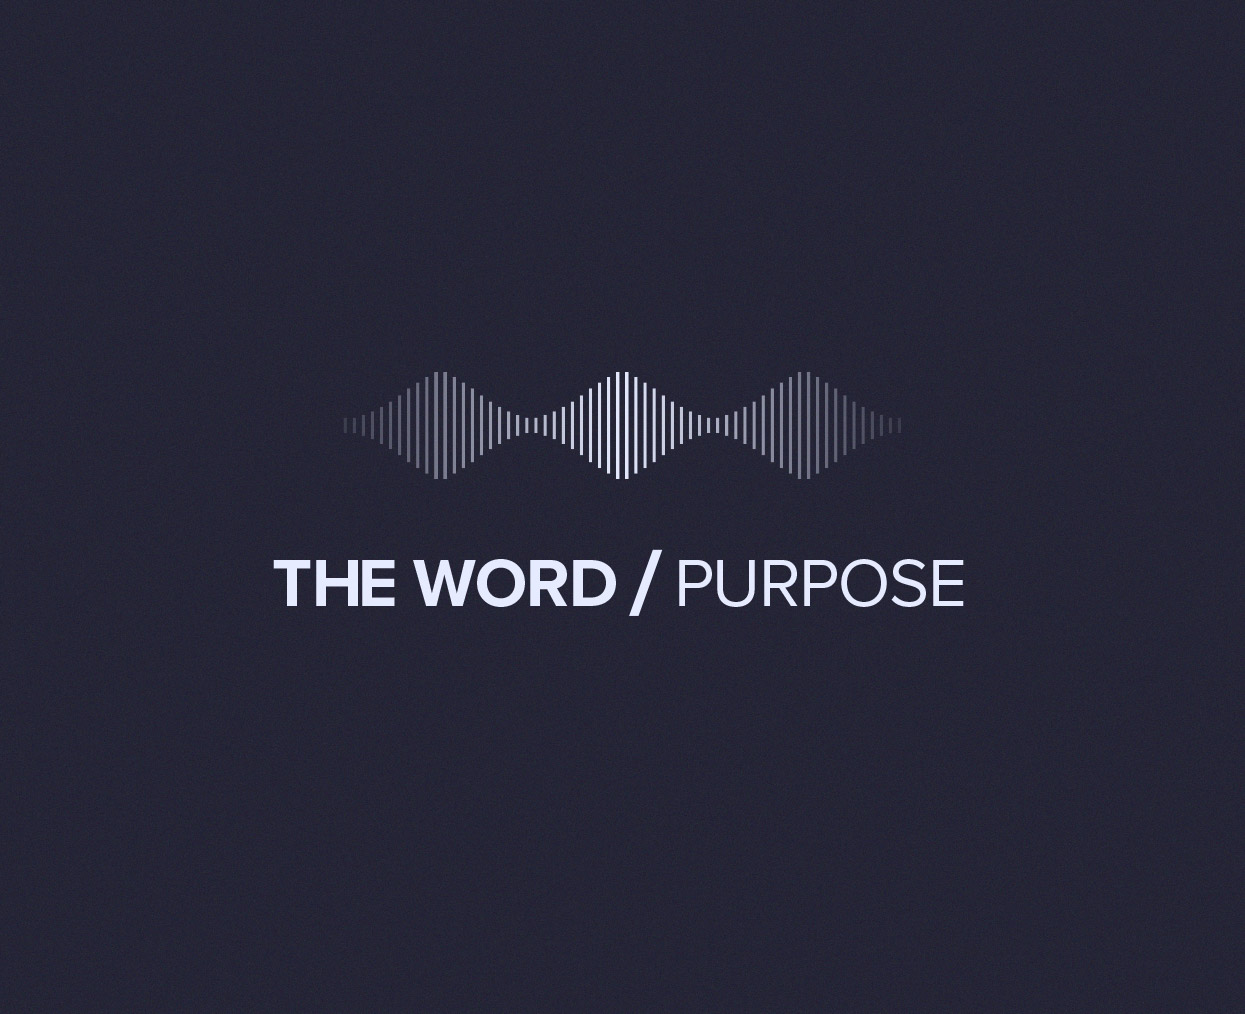 THE WORD/Purpose podcast hero image